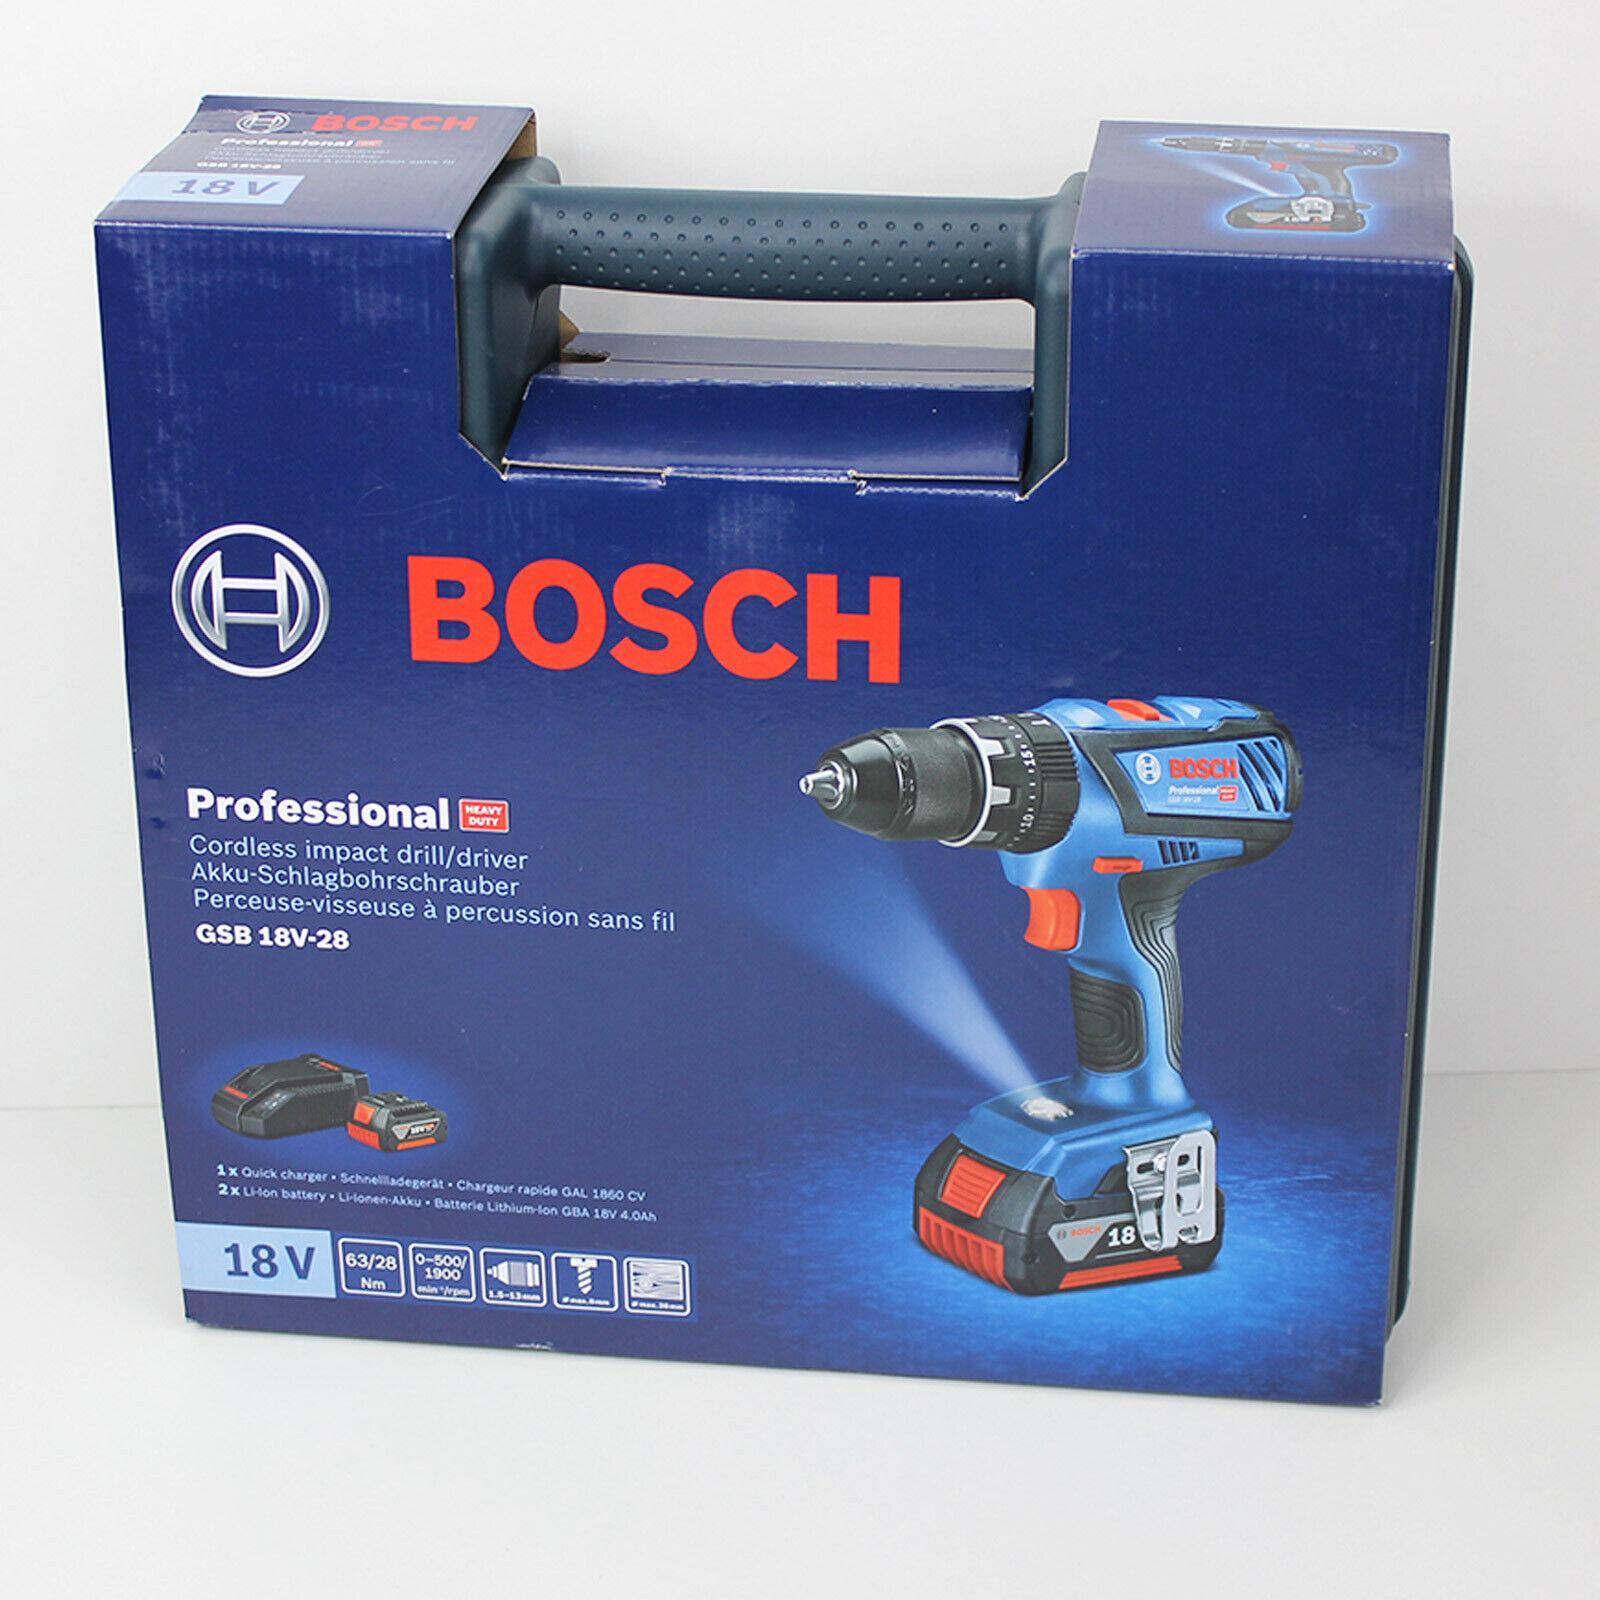 Bosch 18V Akku-Schlagschrauber - GSB 18V-28 - 06019H4005